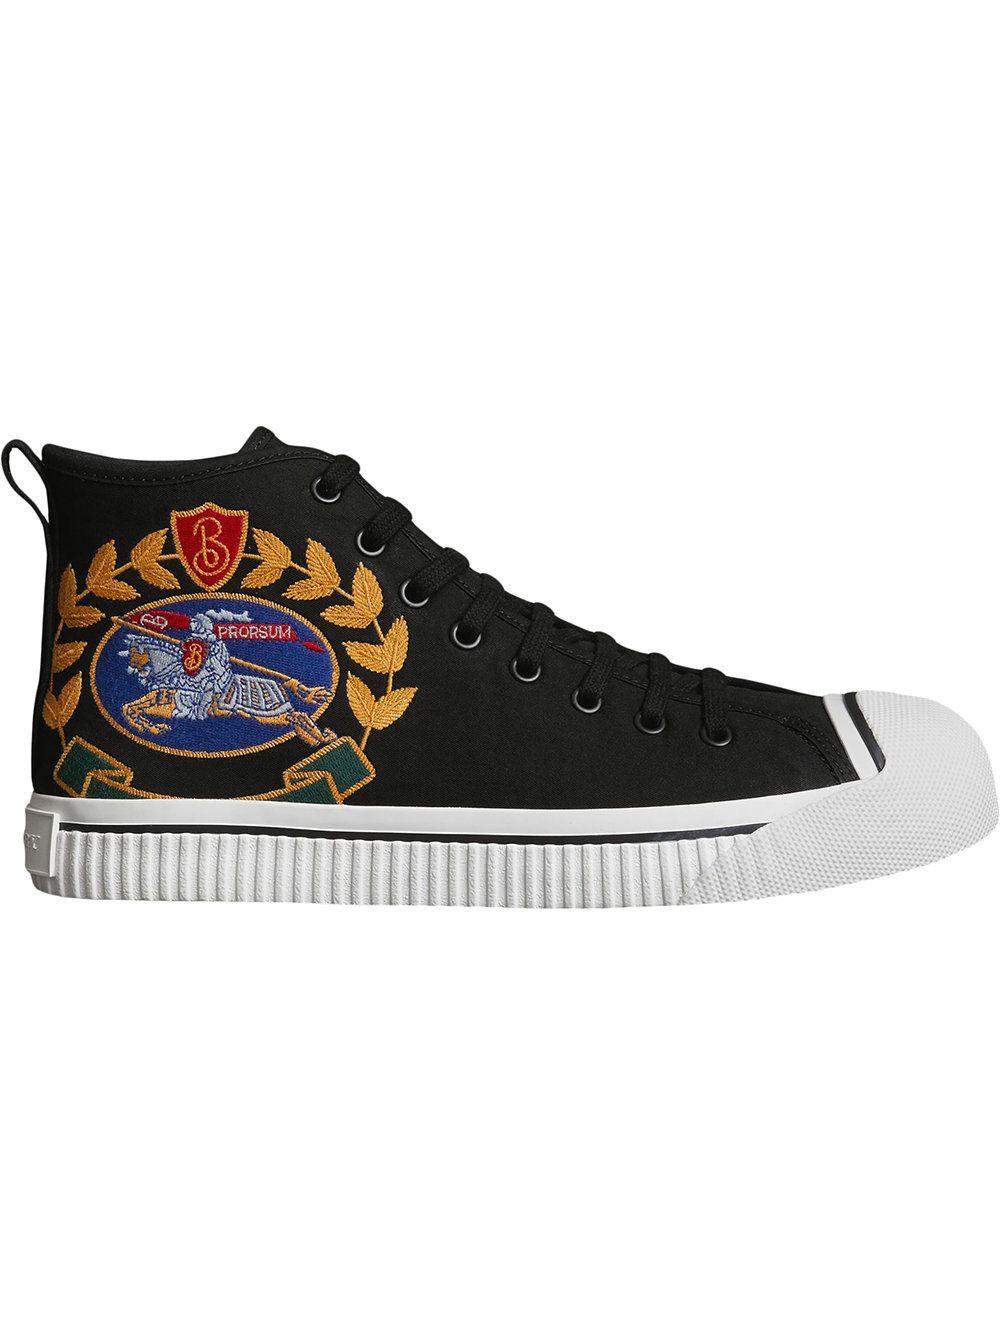 Burberry Archive Logo hi-top sneakers